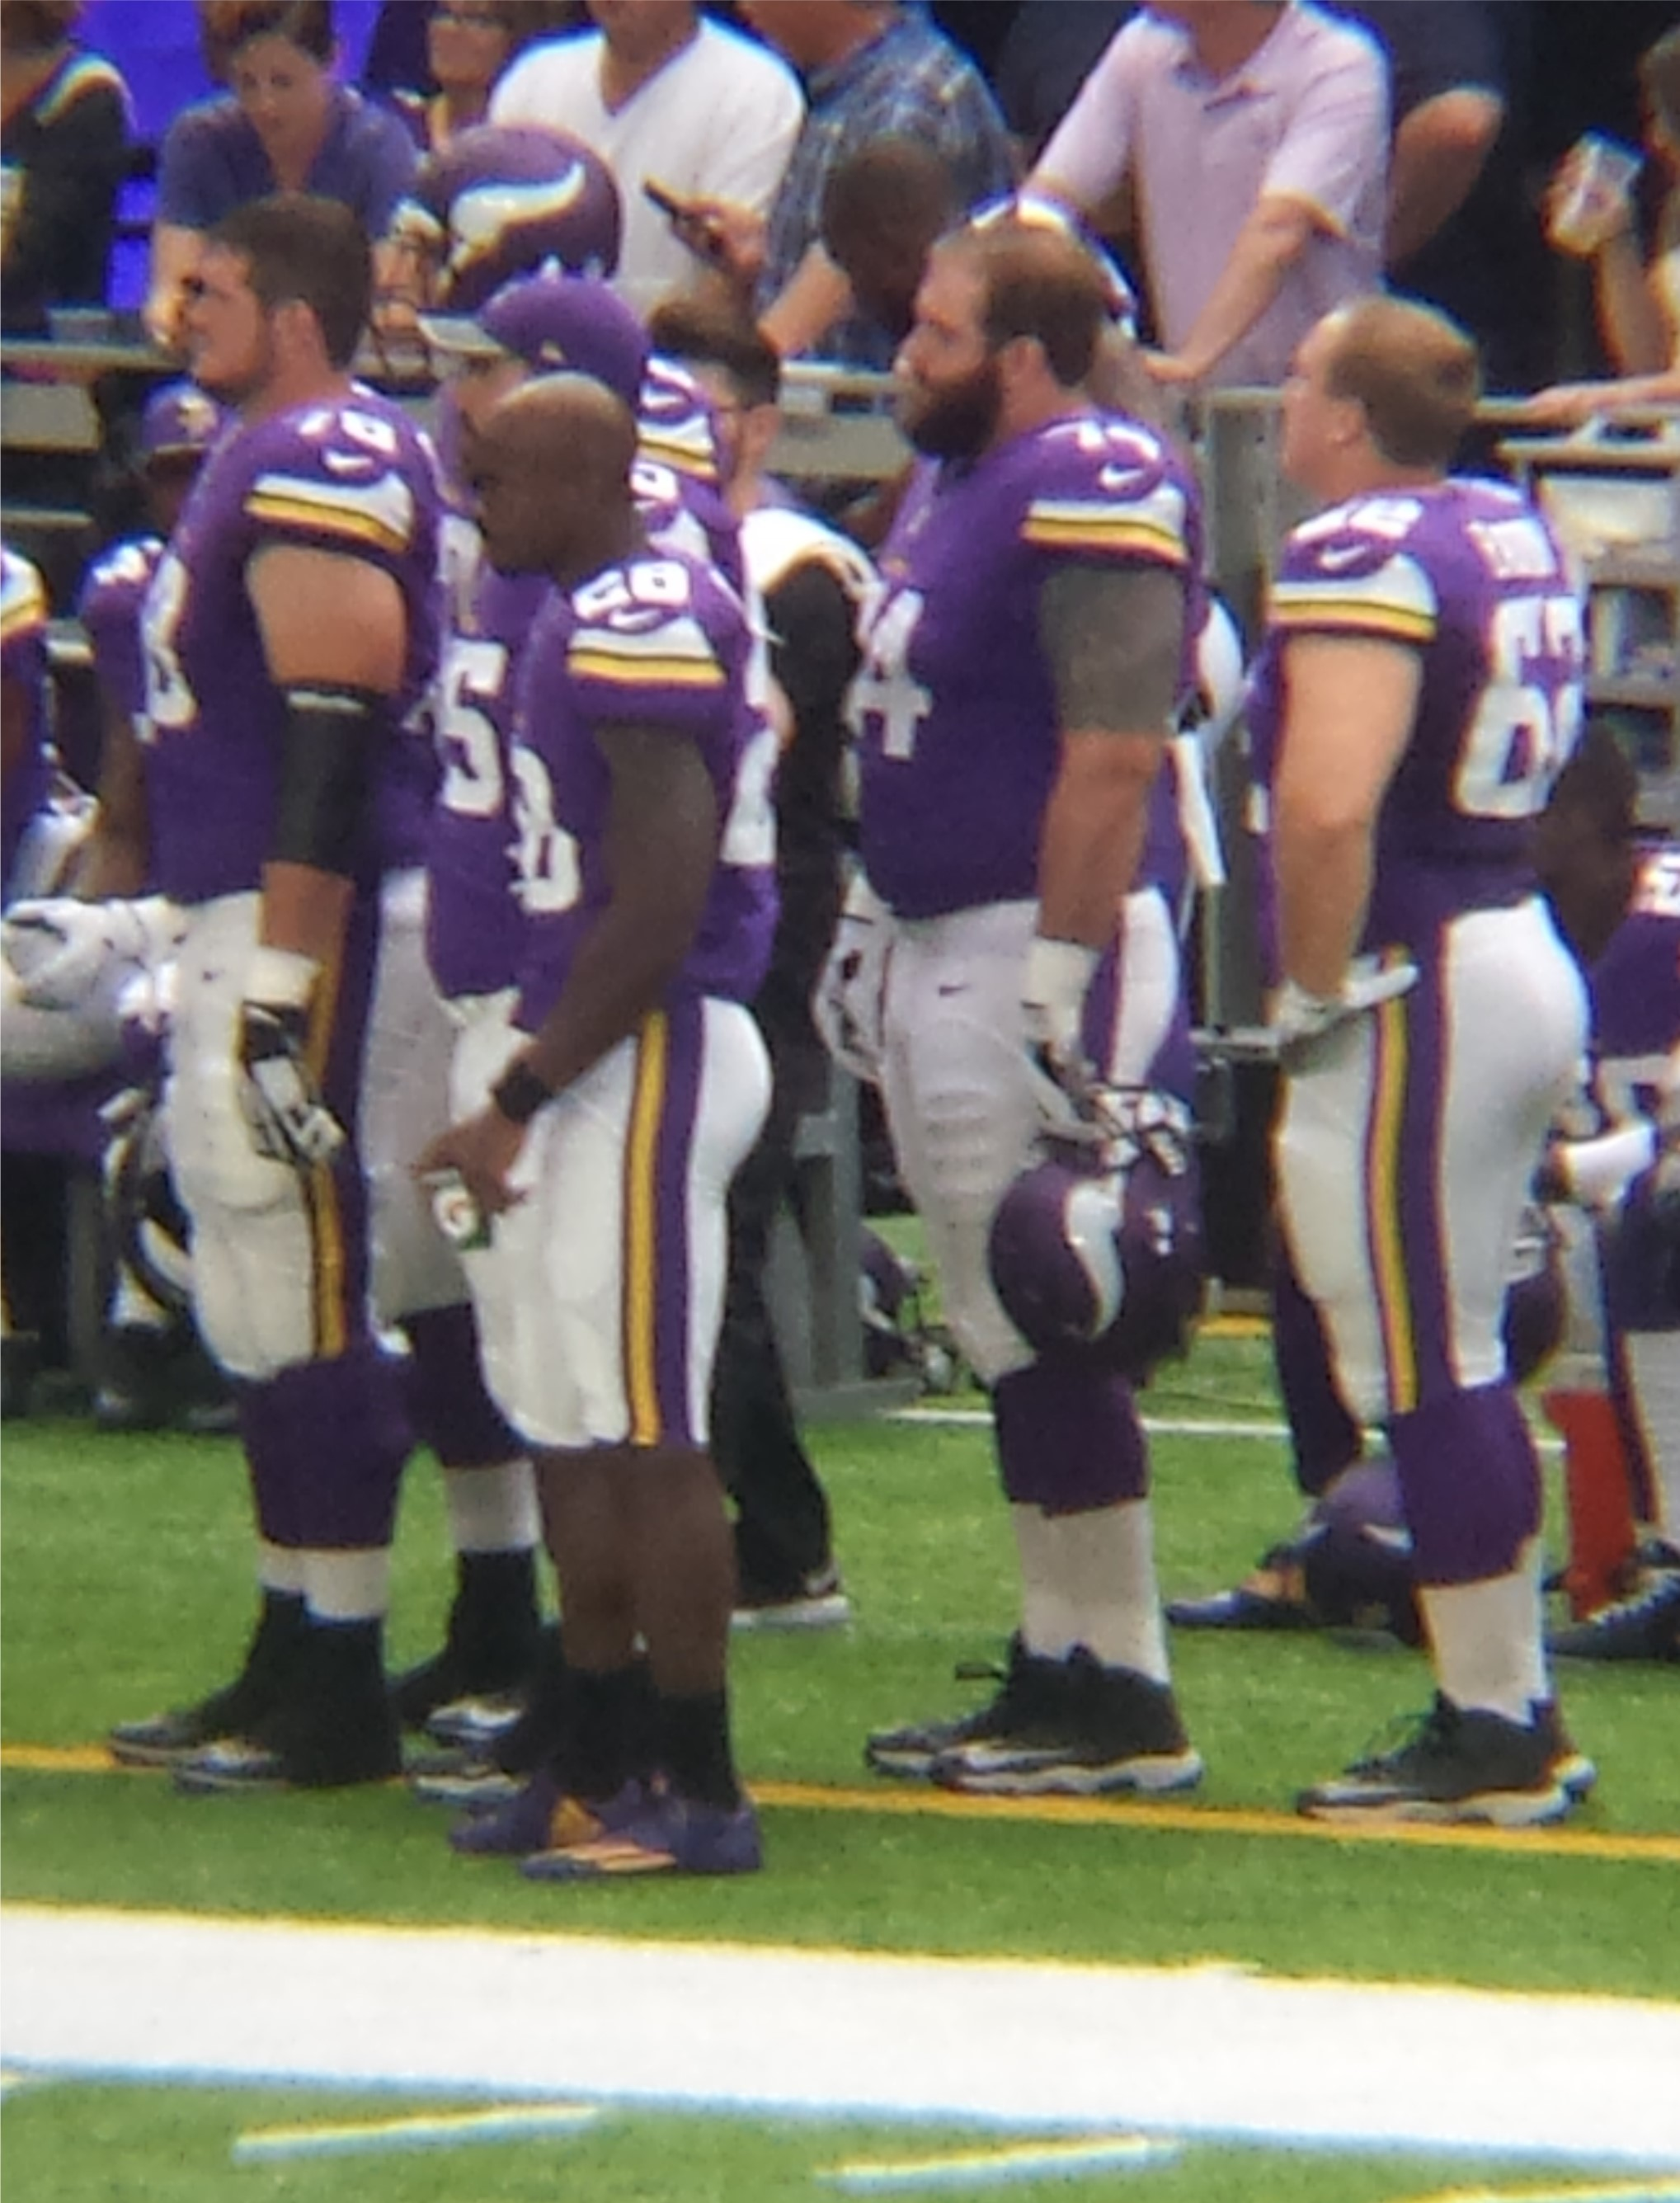 Minnesota Vikings U.S. Bank Stadium First Game - Adrian Peterson